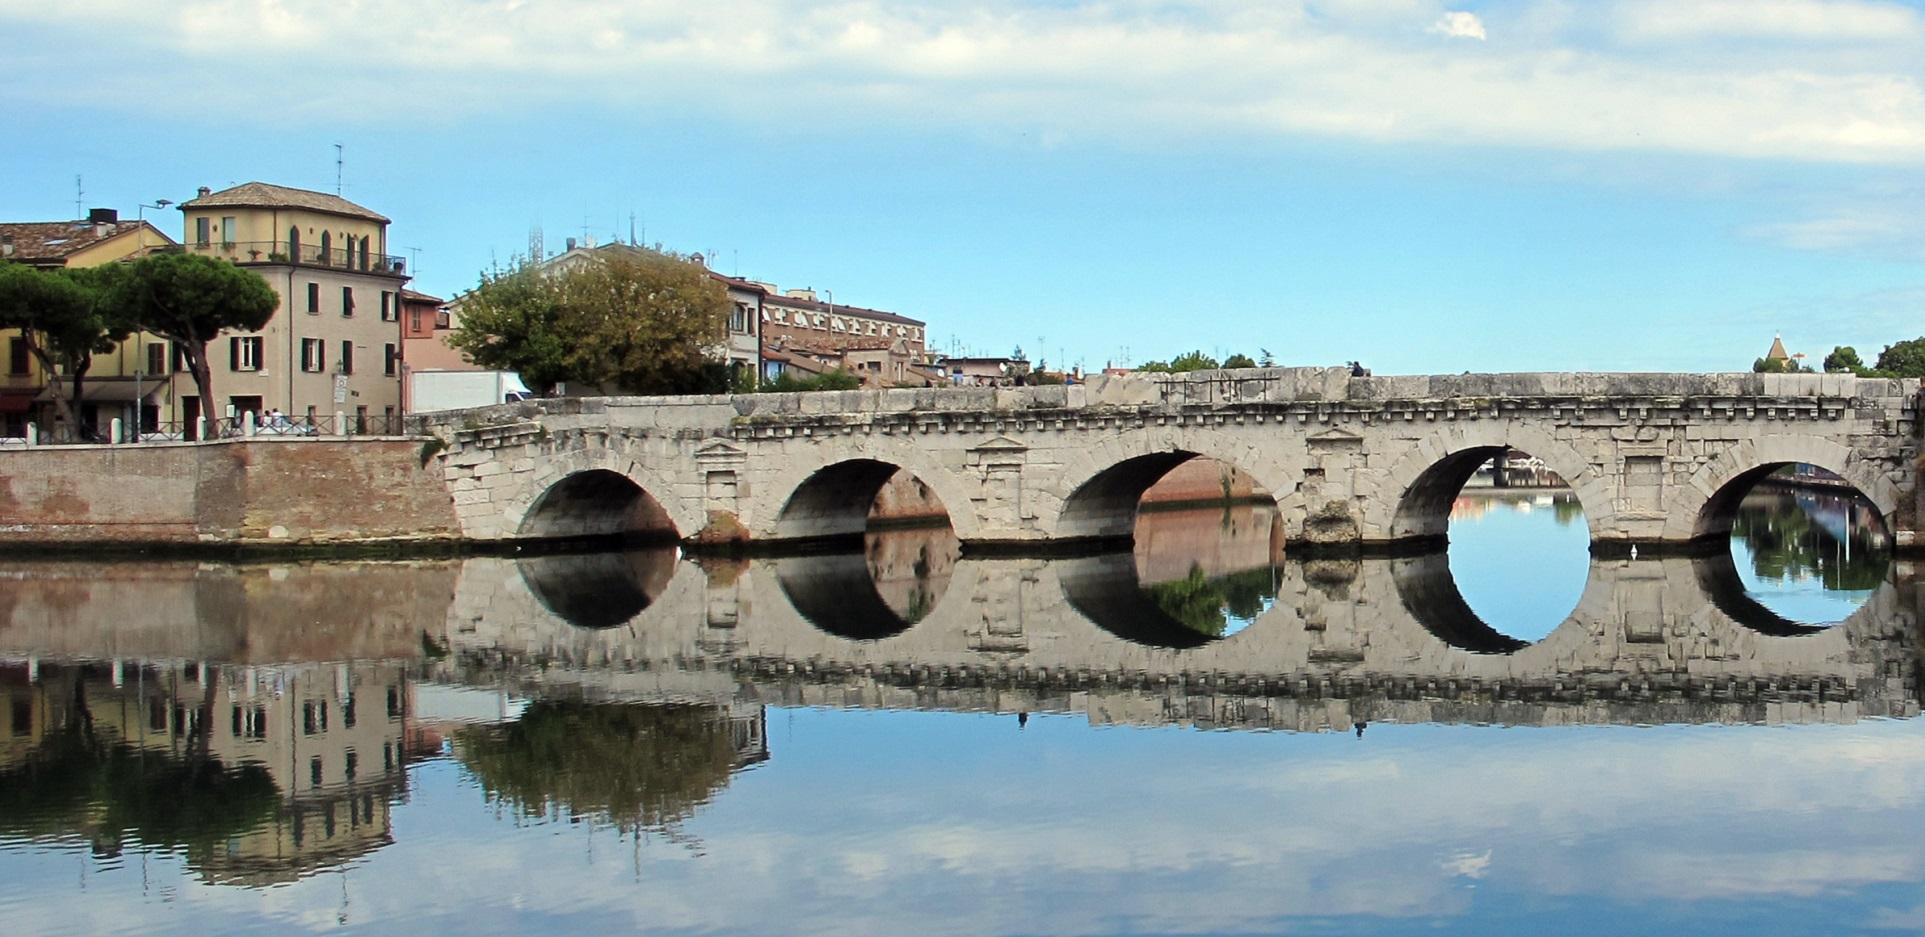 Alliance Française Rimini